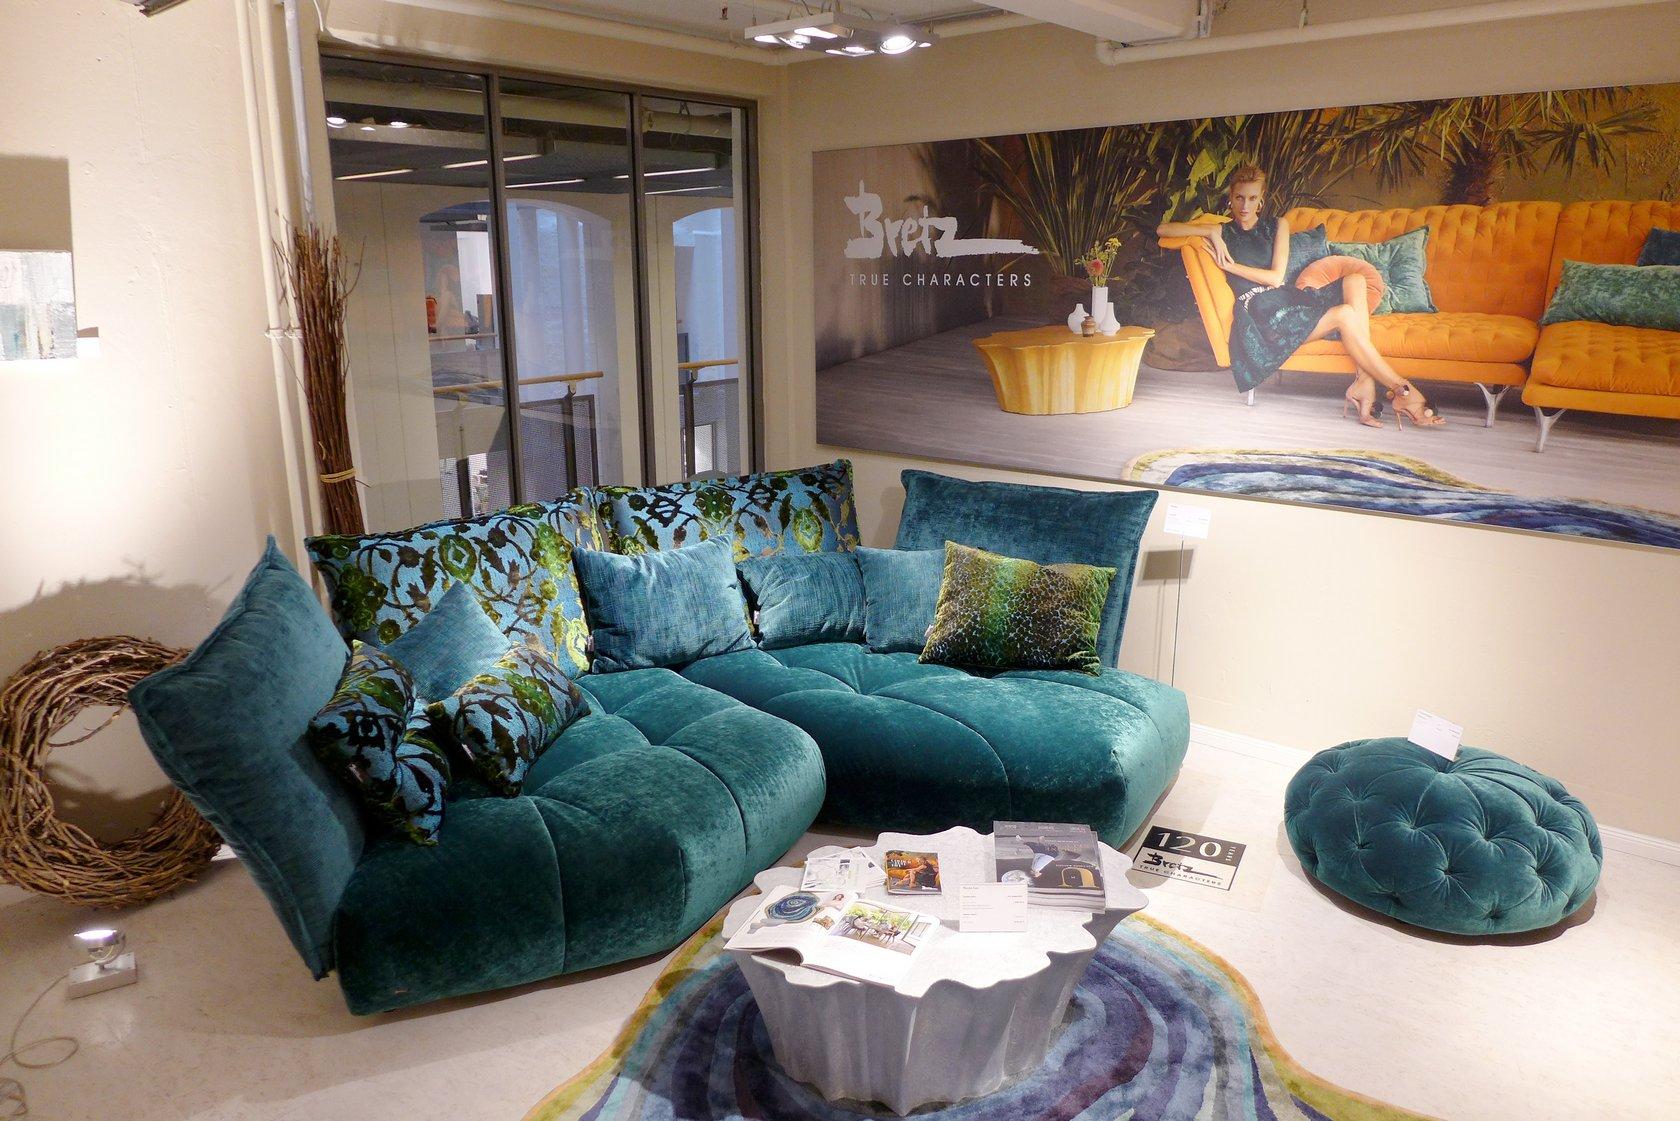 bretz flagship store hamburg stilwerk 2017 06 13 017 bretz store hamburg. Black Bedroom Furniture Sets. Home Design Ideas